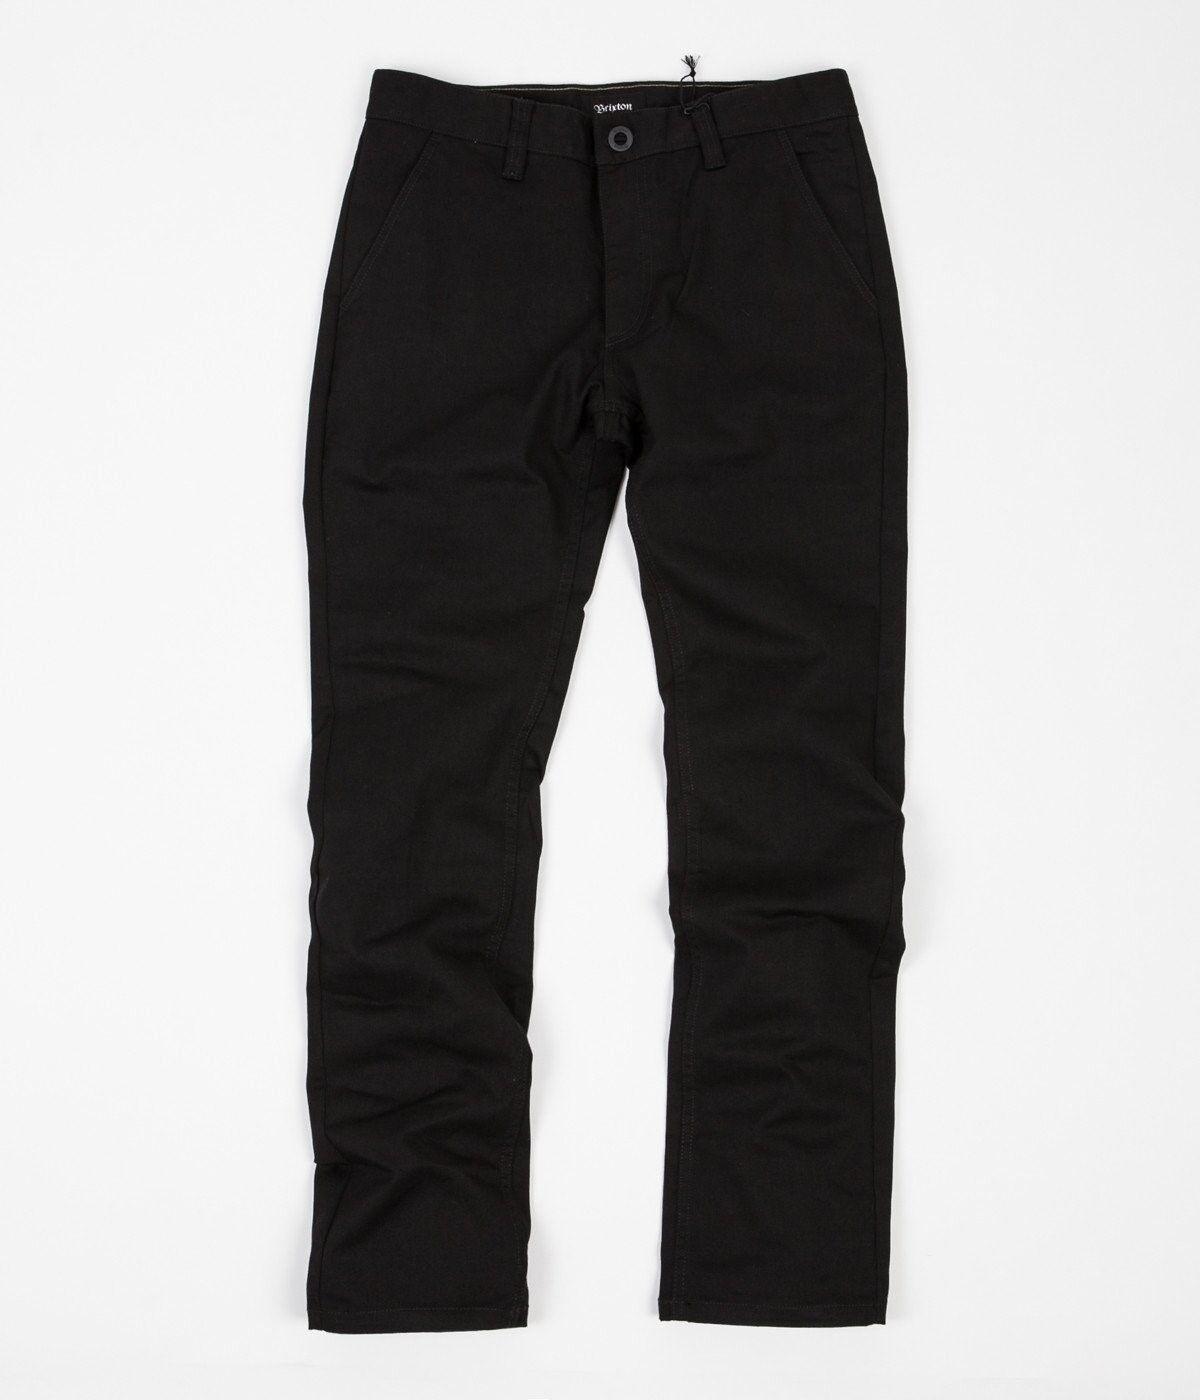 Brixton Reserve Chino Pant Trousers Standard Fit Fit Fit schwarz Straight Leg 36W 33L BNWT d3132d